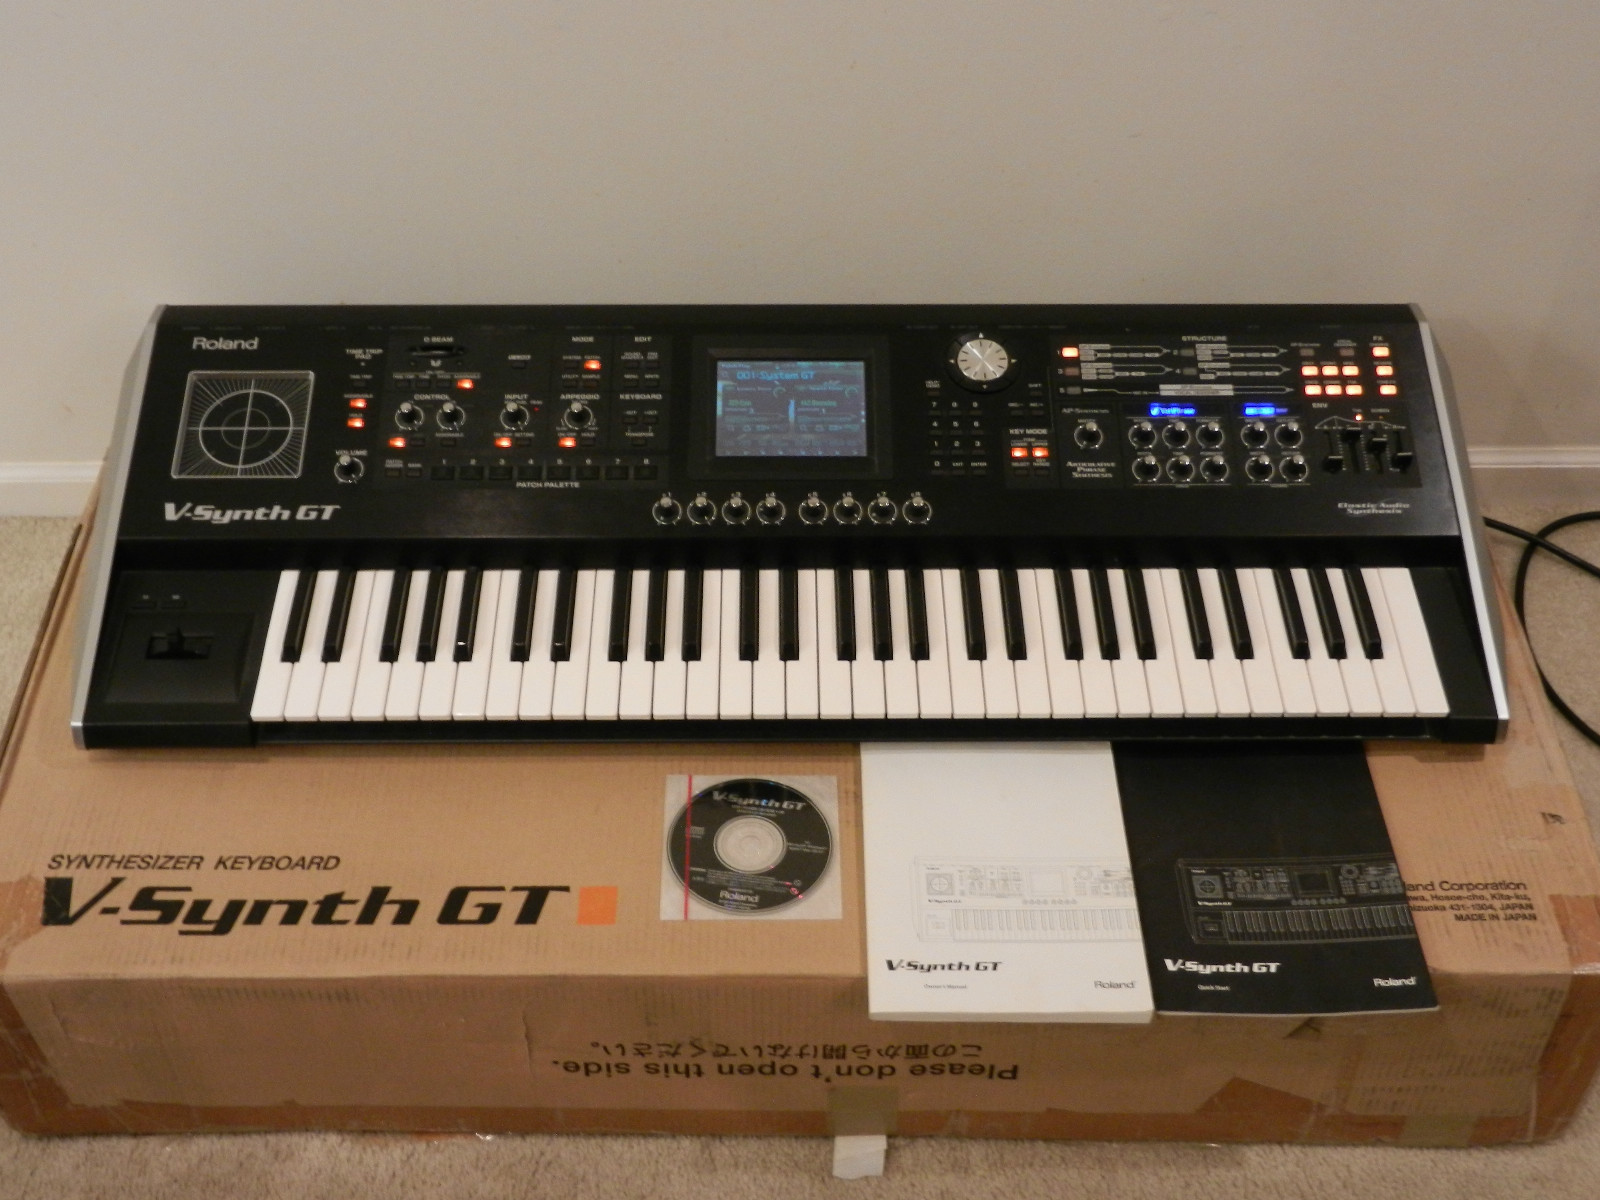 matrixsynth b roland v synth gt synthesizer rh b matrixsynth com Roland Synth Forum roland v synth gt manual pdf